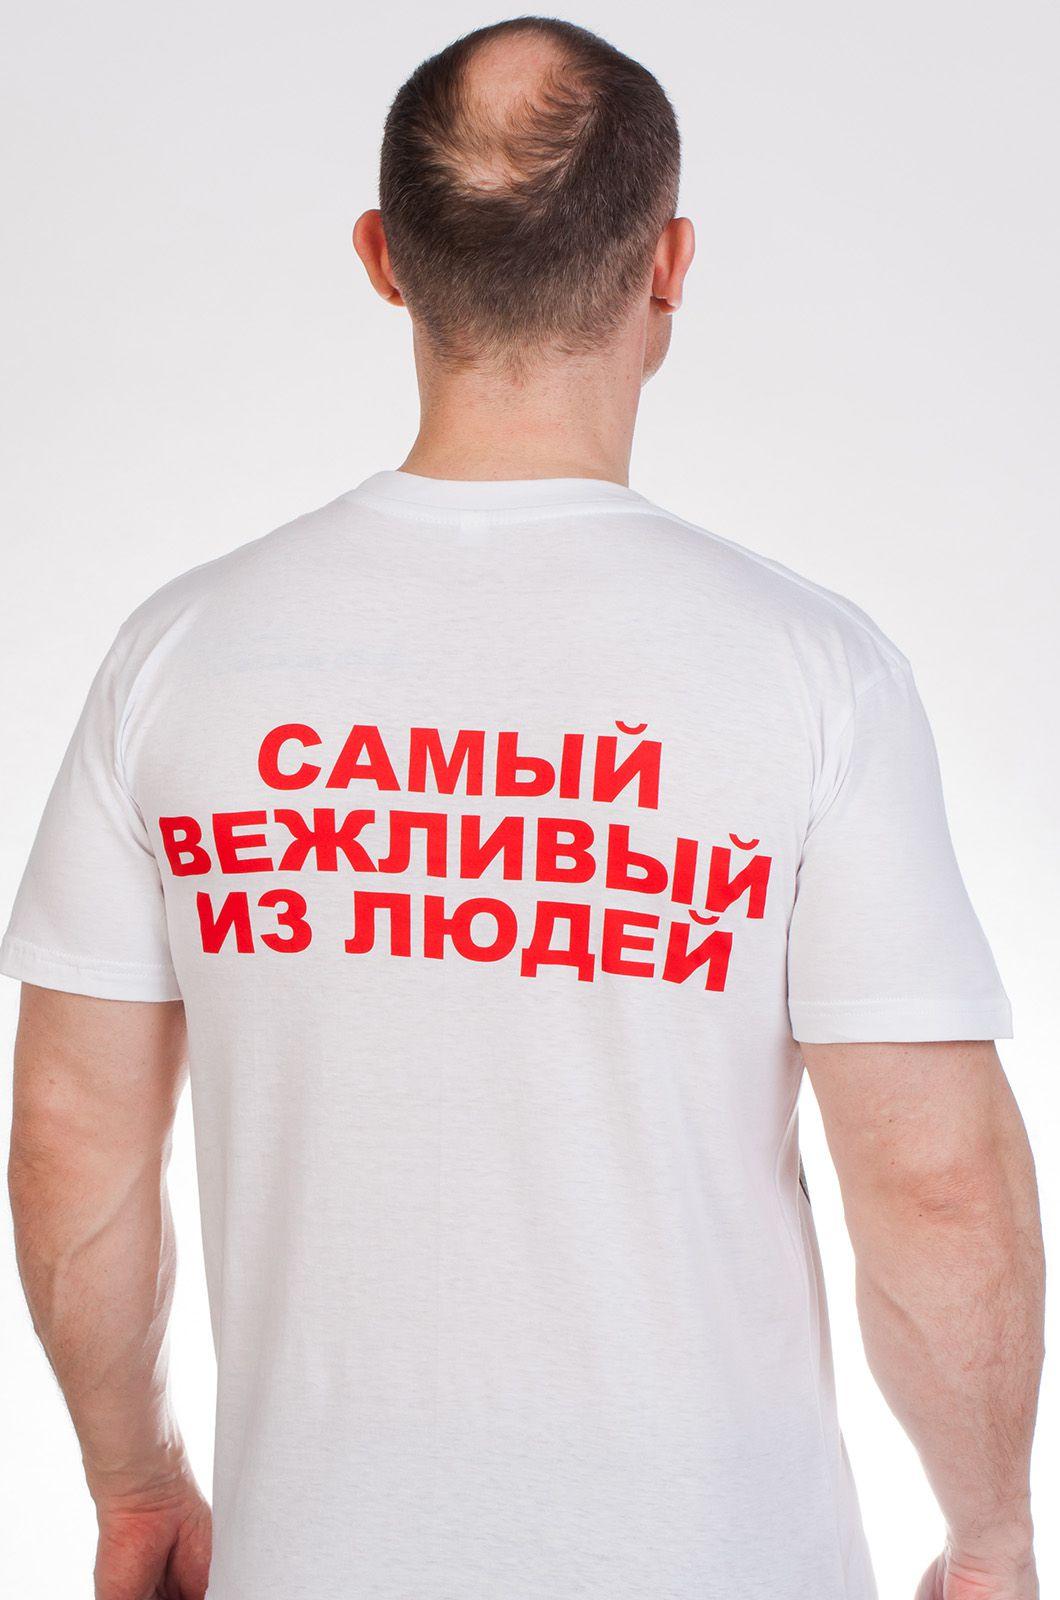 Футболка с изображением Путина по цене производителя